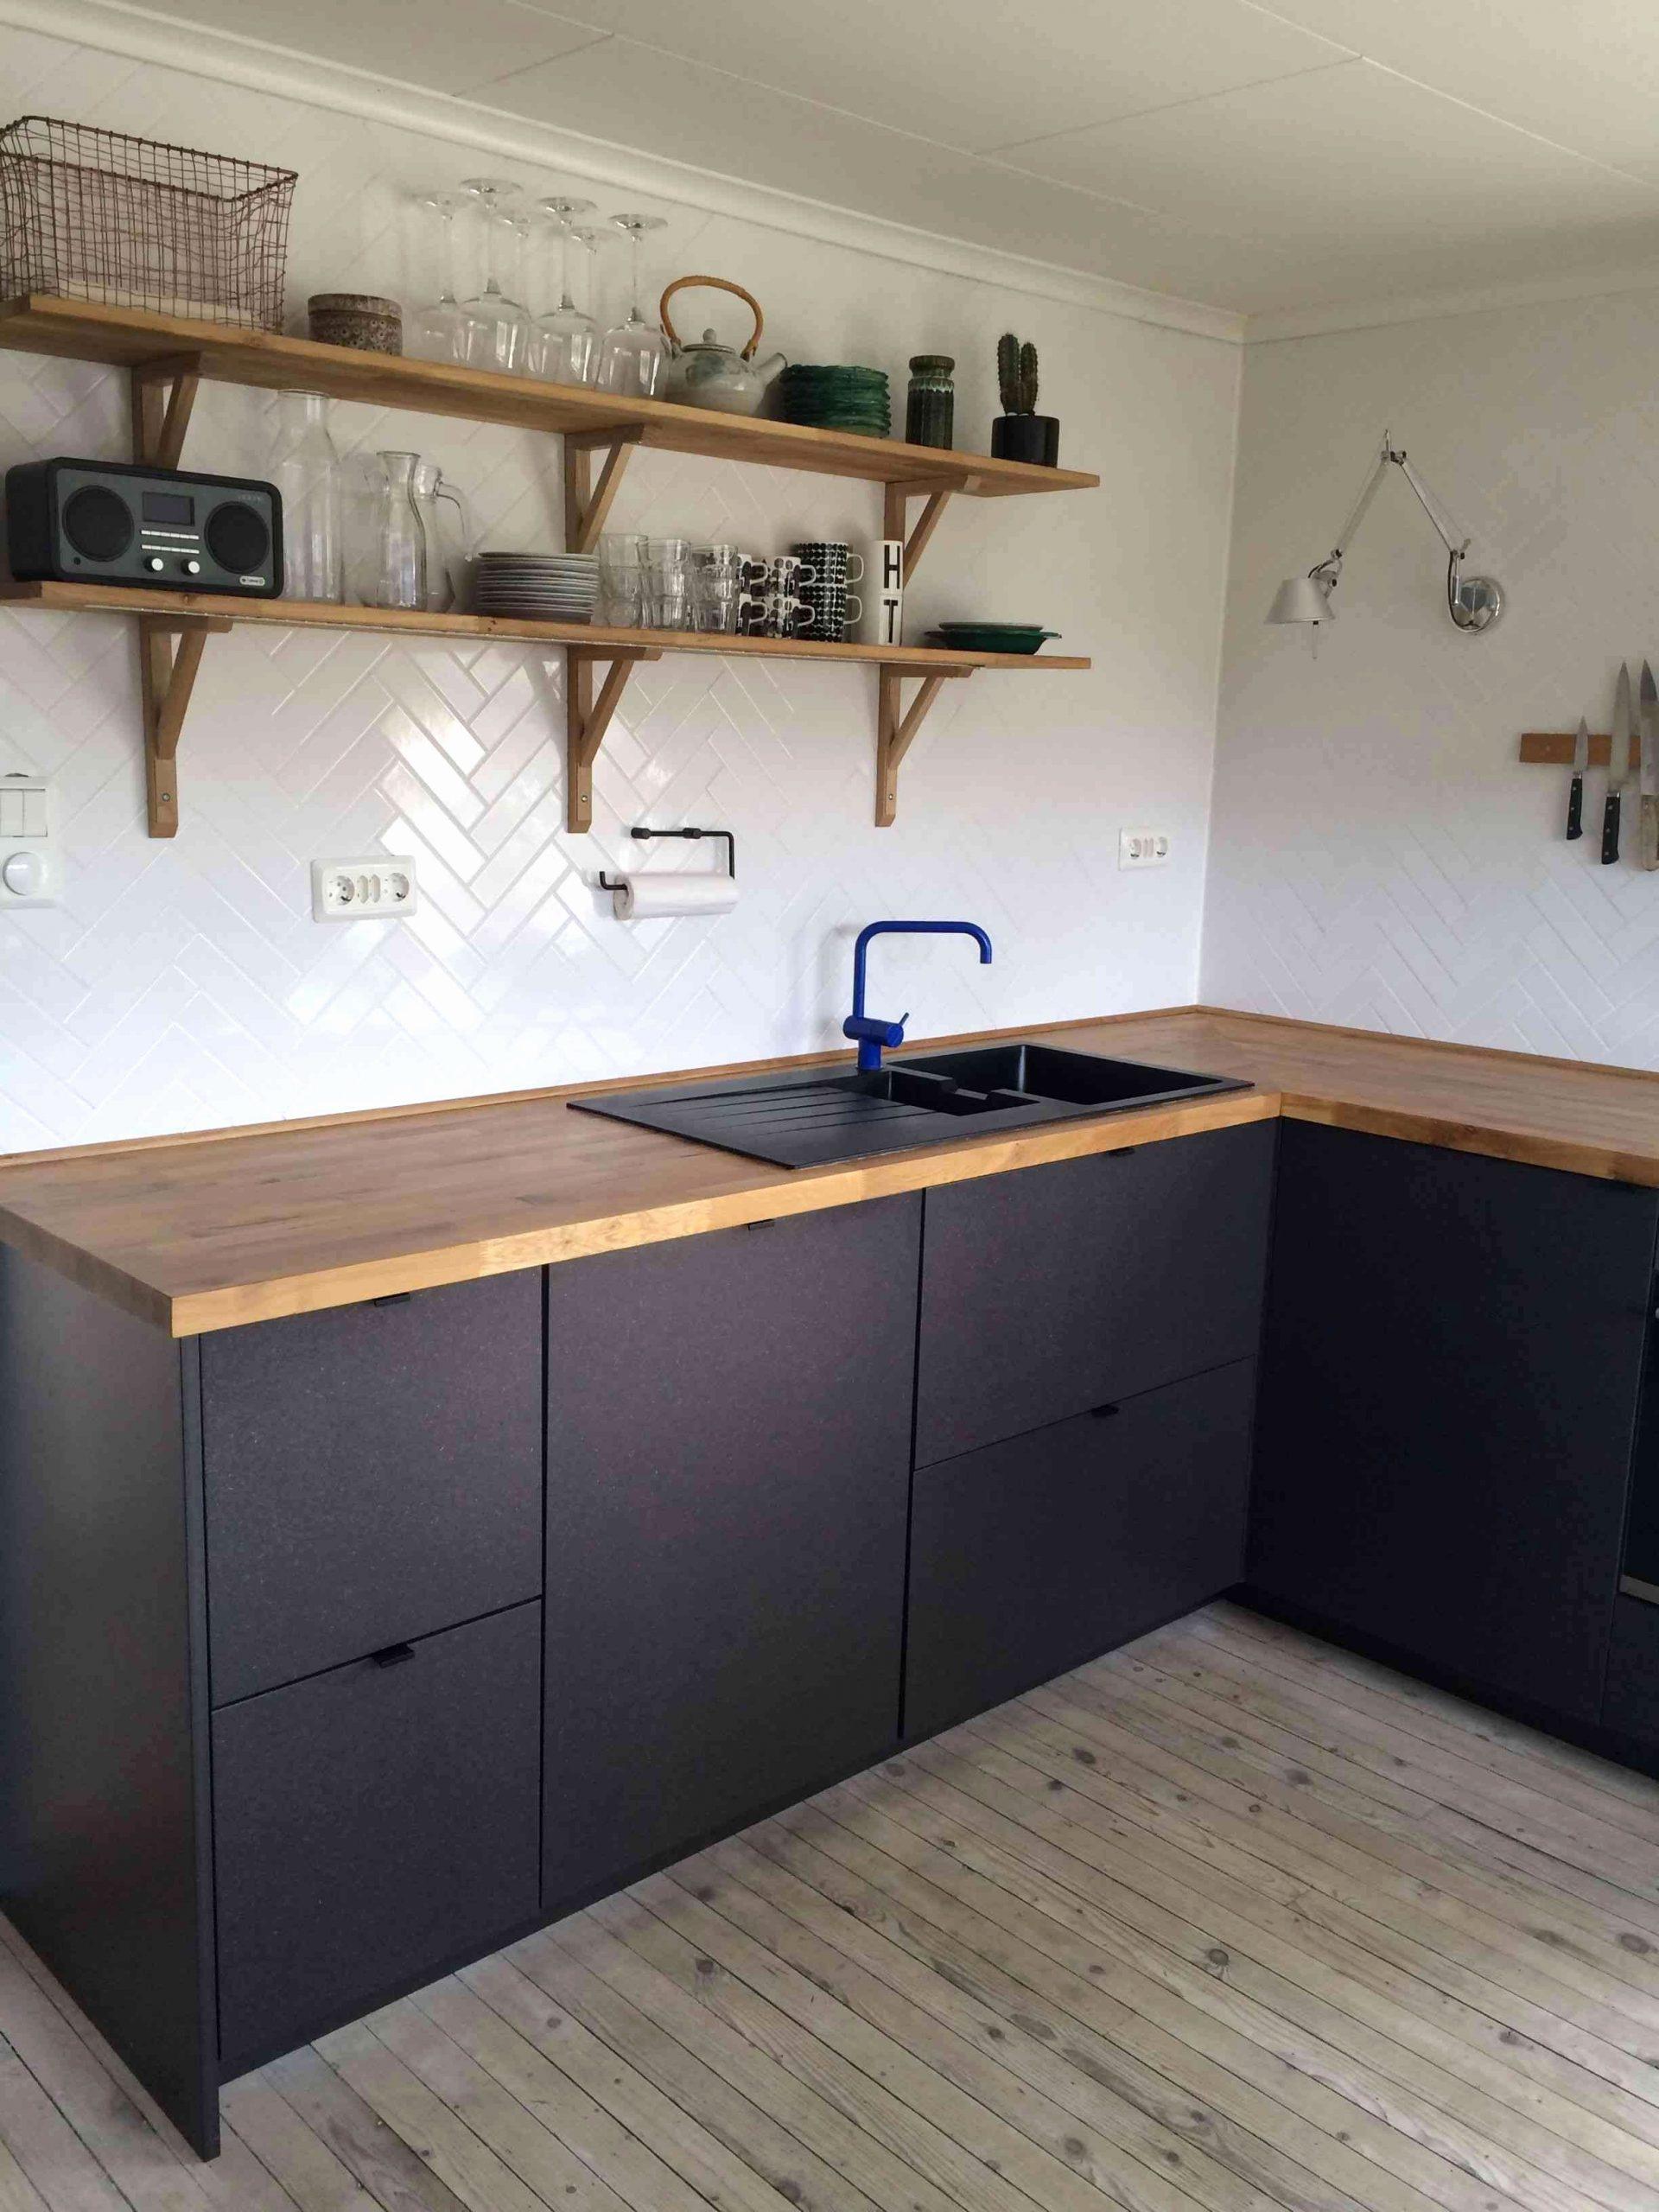 Full Size of Ikea Küchen Unterschrank Nvowuhftxbckzl7 Küche Küche Blende